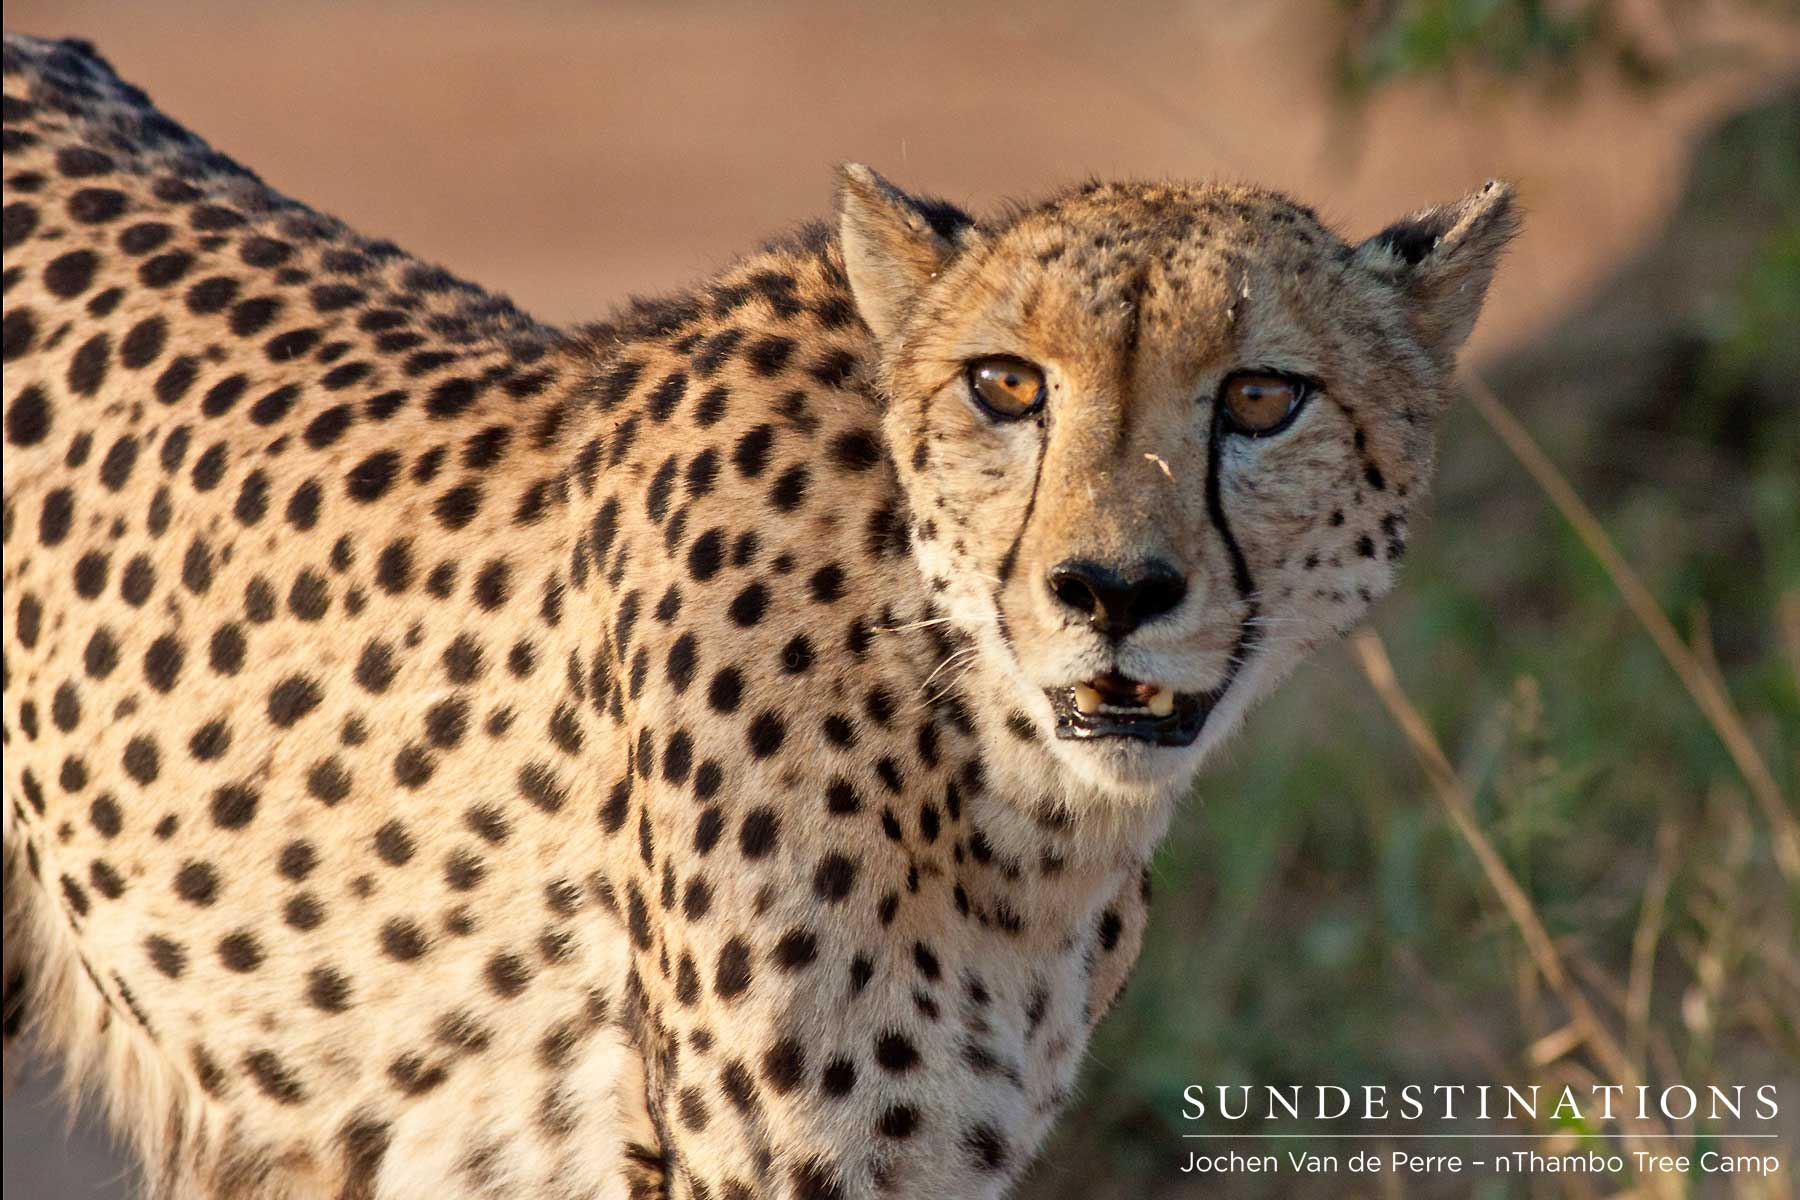 Rare Sighting: Cute and Fluffy Cheetah Cubs